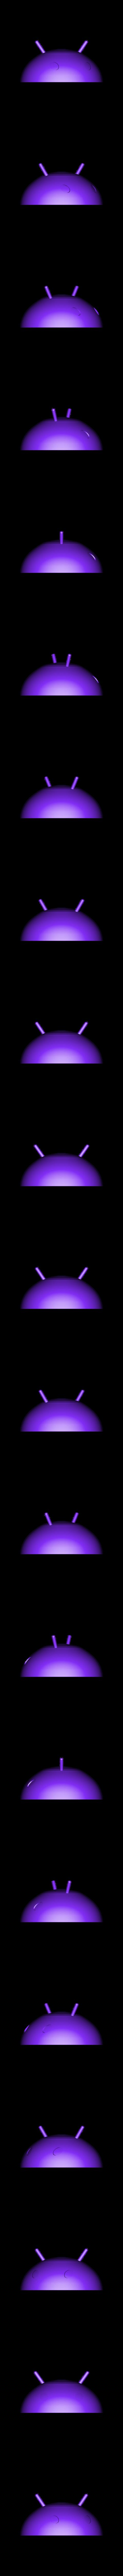 Bugdroid_Head.stl Download free STL file Bugdroid - Android Mascot • 3D printing object, ChaosCoreTech